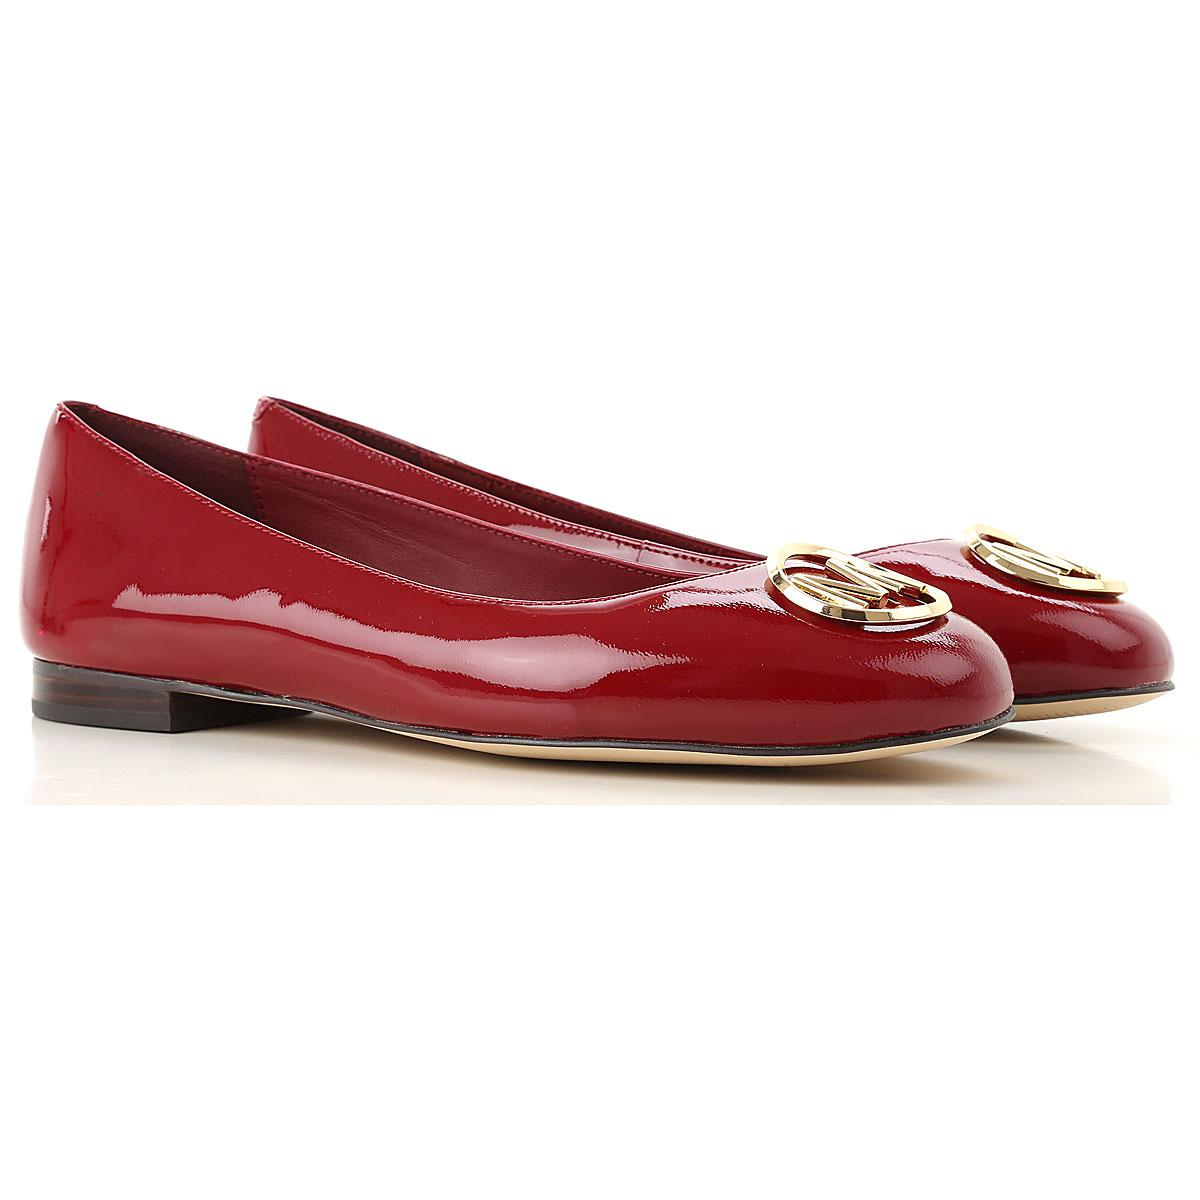 cbb814a62c785 Michael Kors Ballet Flats Ballerina Shoes For Women in Red - Lyst